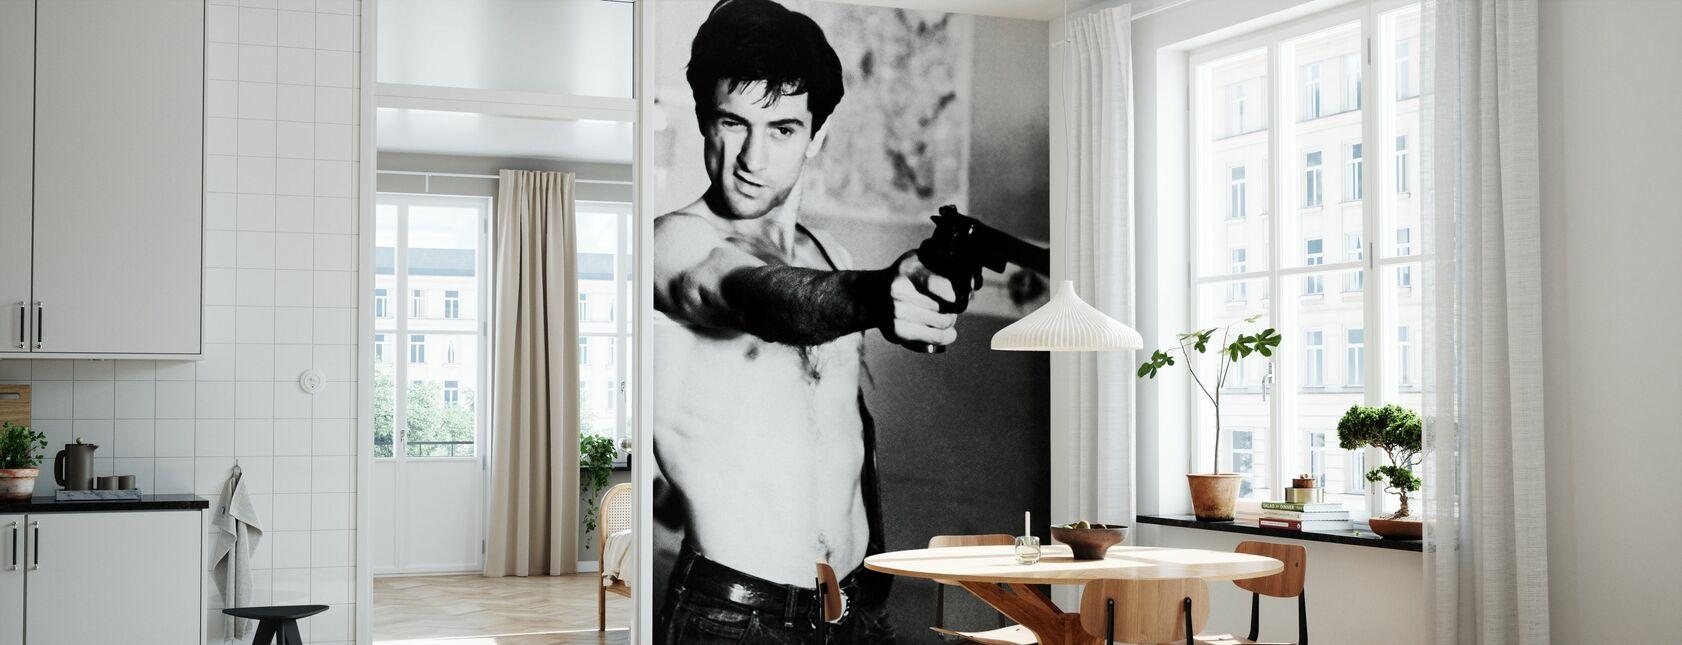 Taxi Driver - Gun - Wallpaper - Kitchen